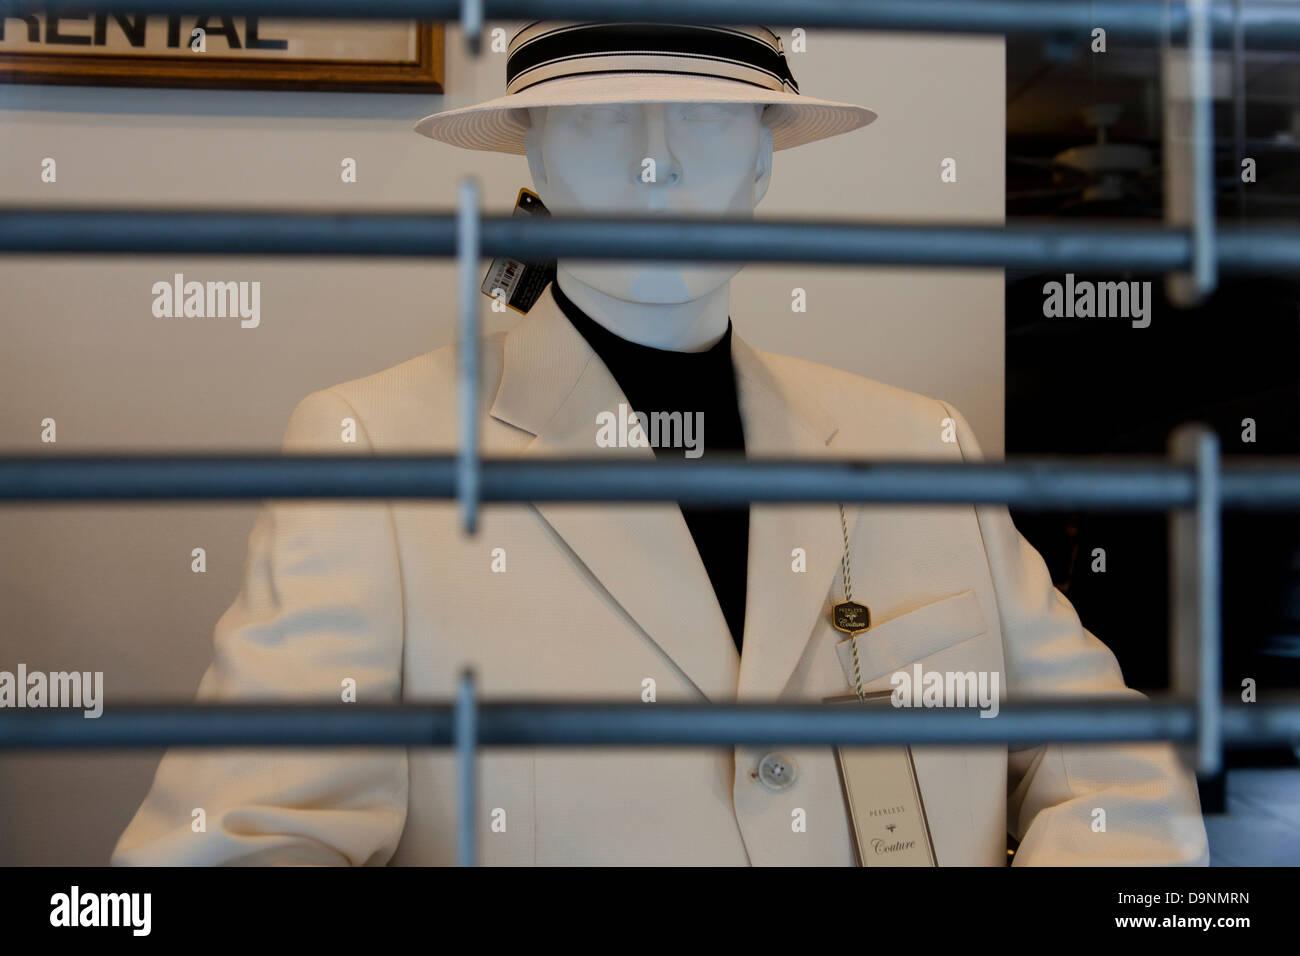 Men's business attire on mannequin behind barred shutter - Stock Image